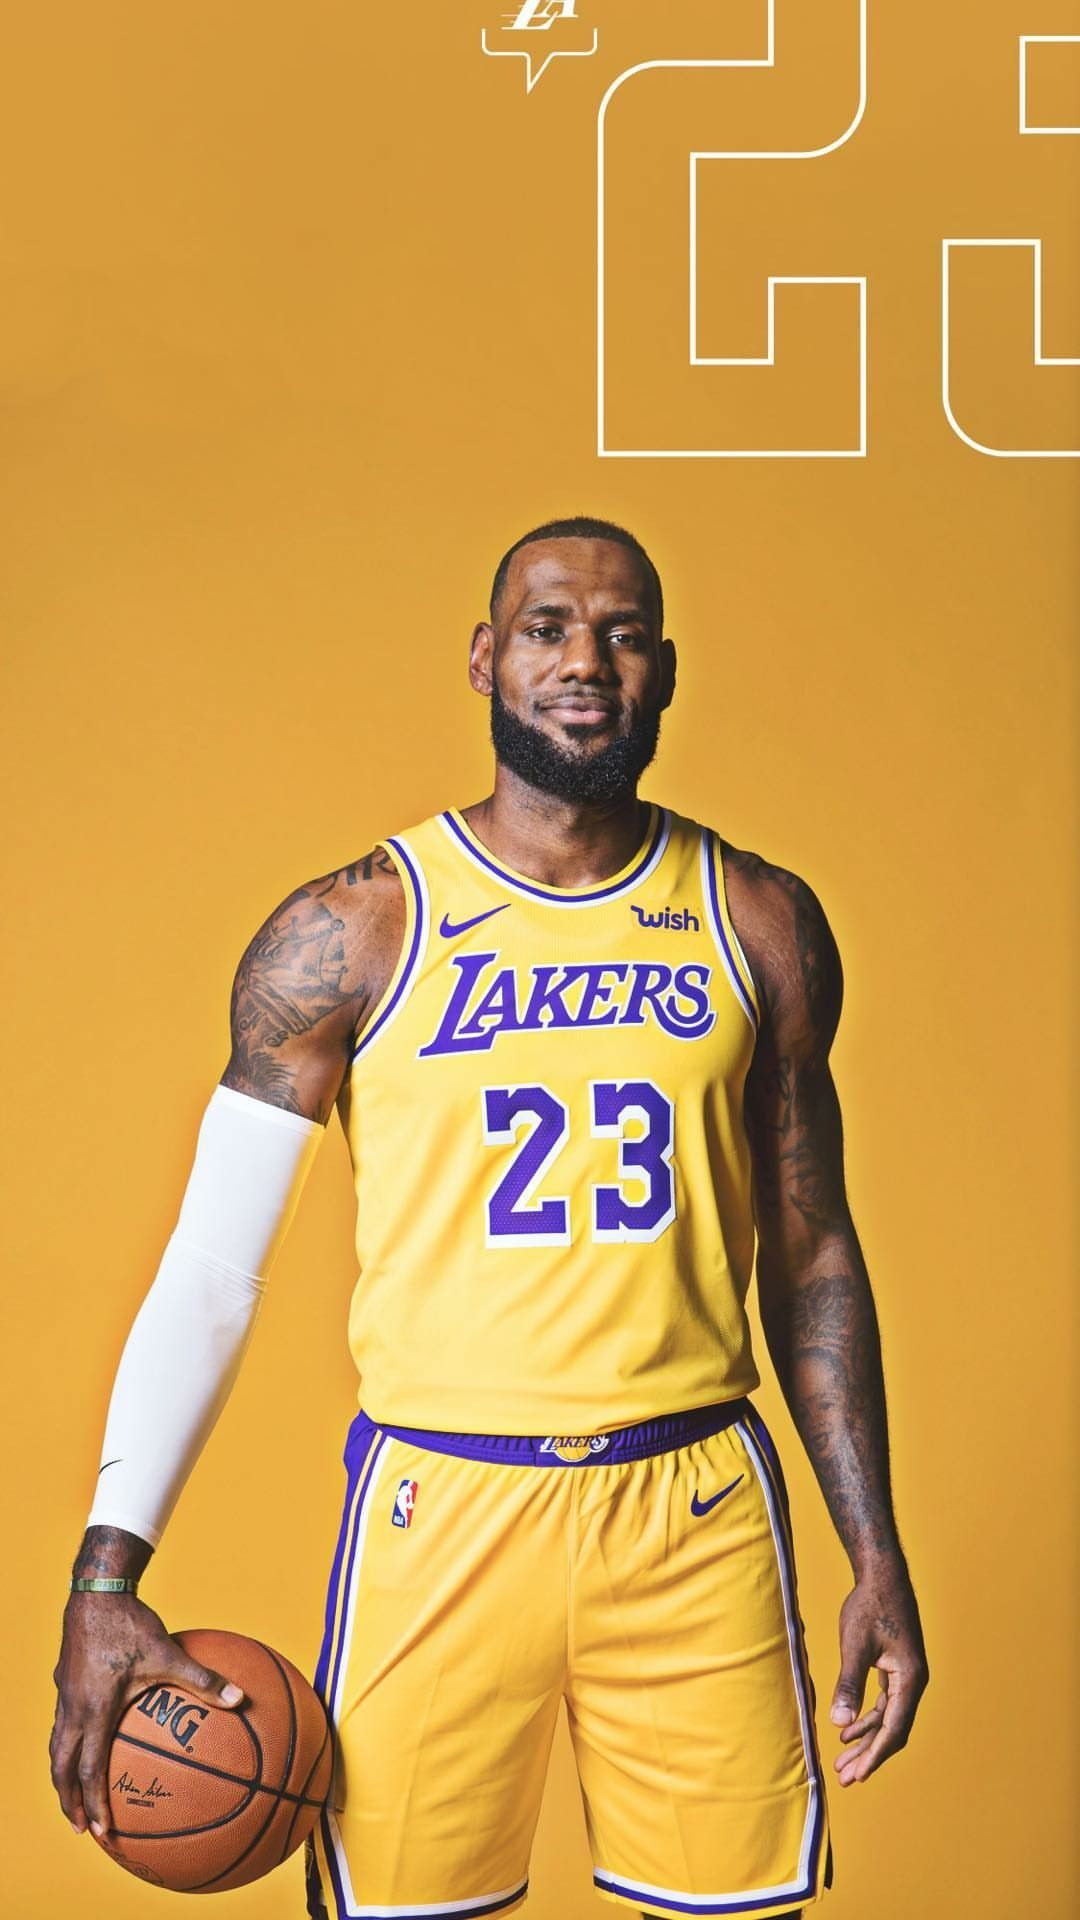 Lebron James La Lakers Wallpaper Lebron James Wallpapers Lebron James Lebron James Images